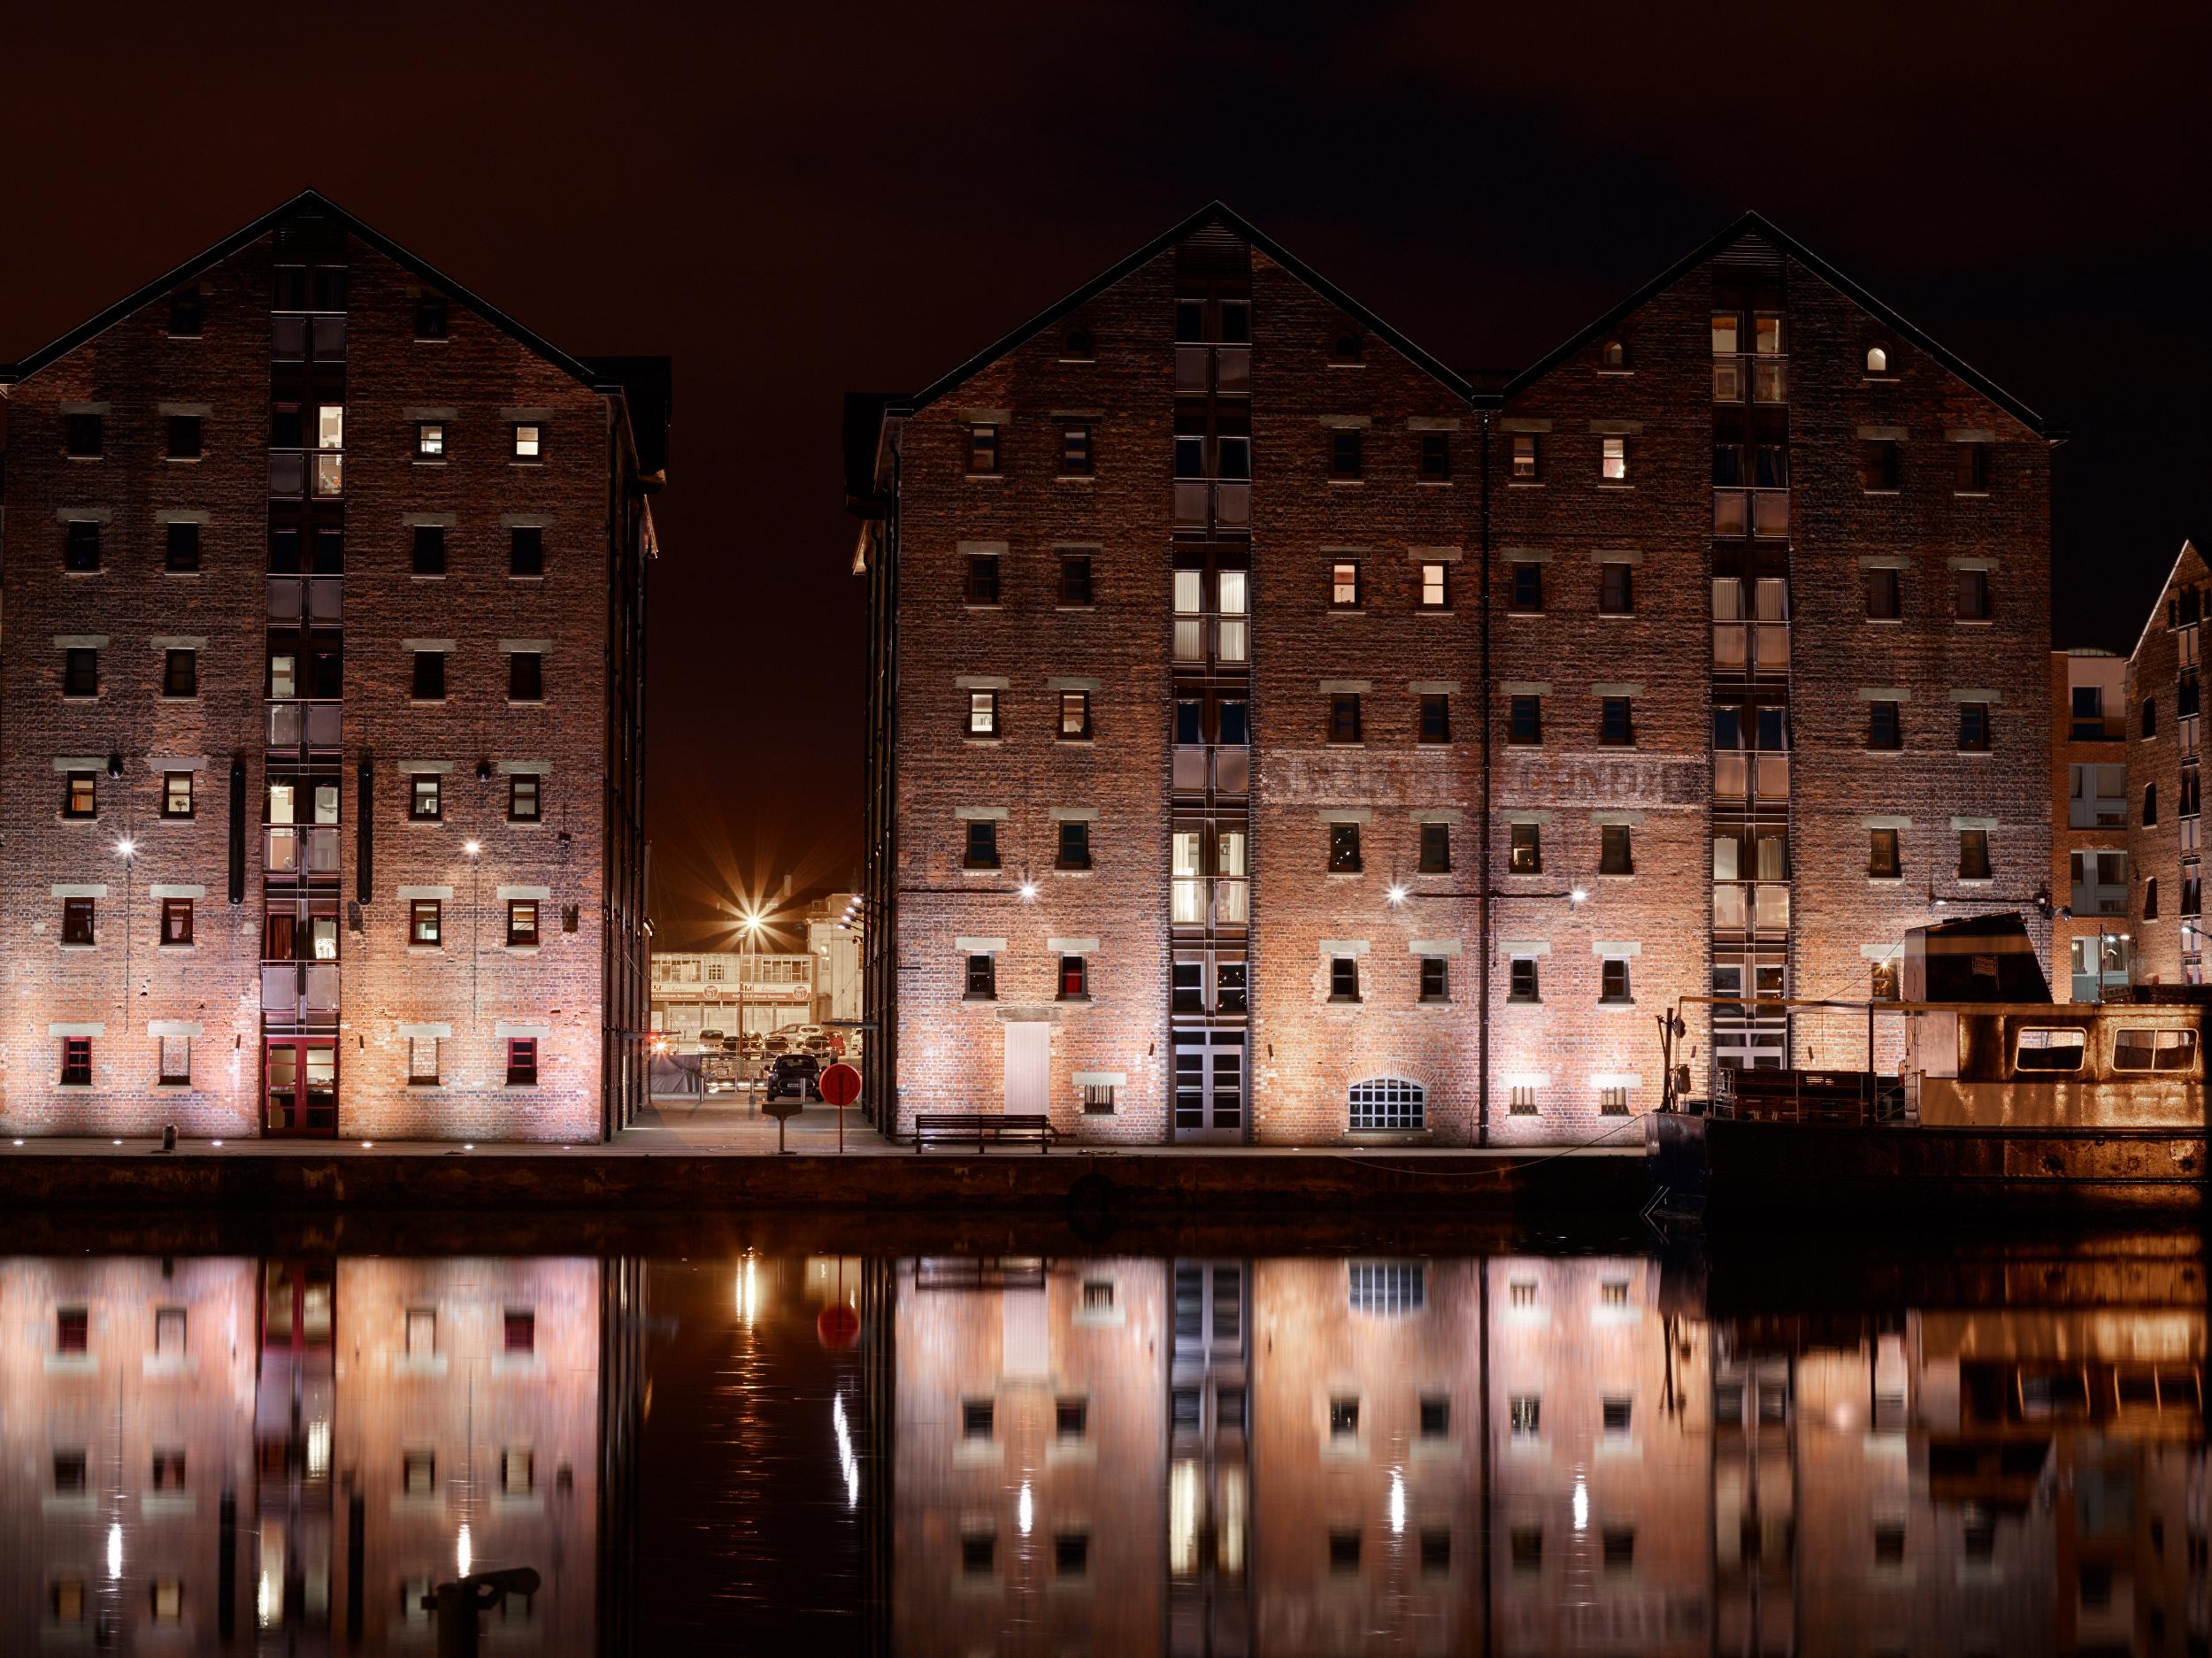 Gloucester_001.jpg